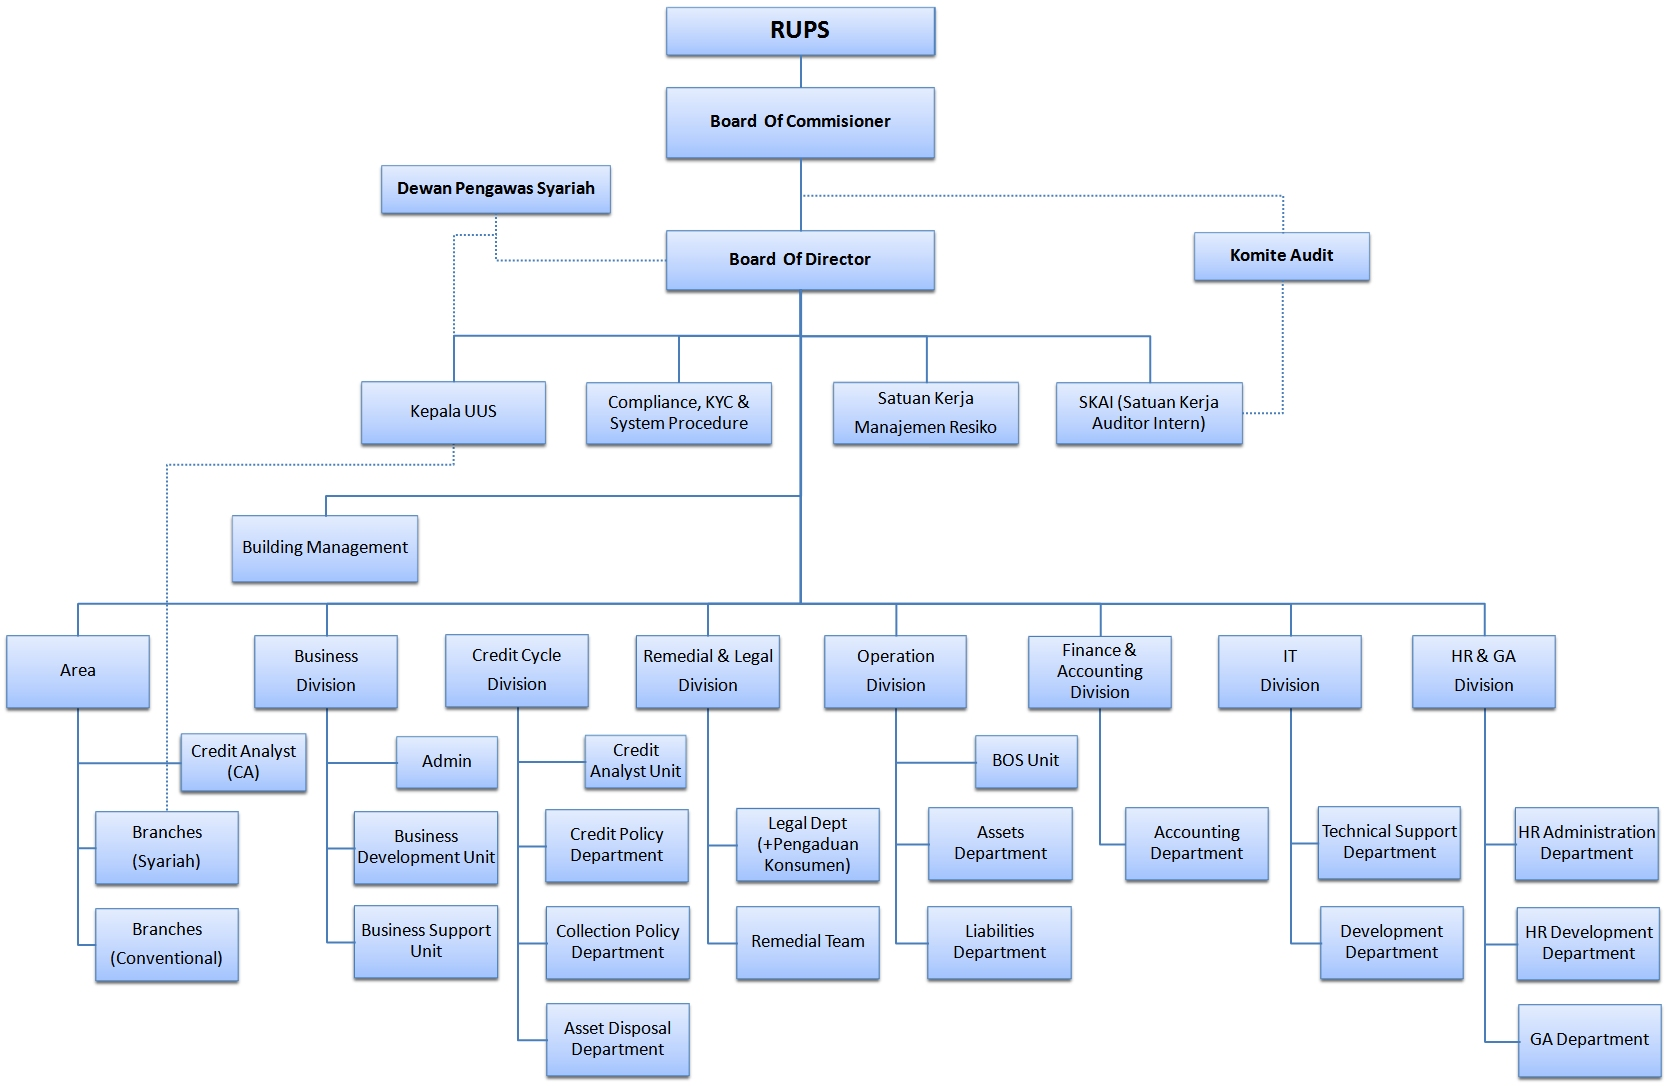 struktur_organisasi1